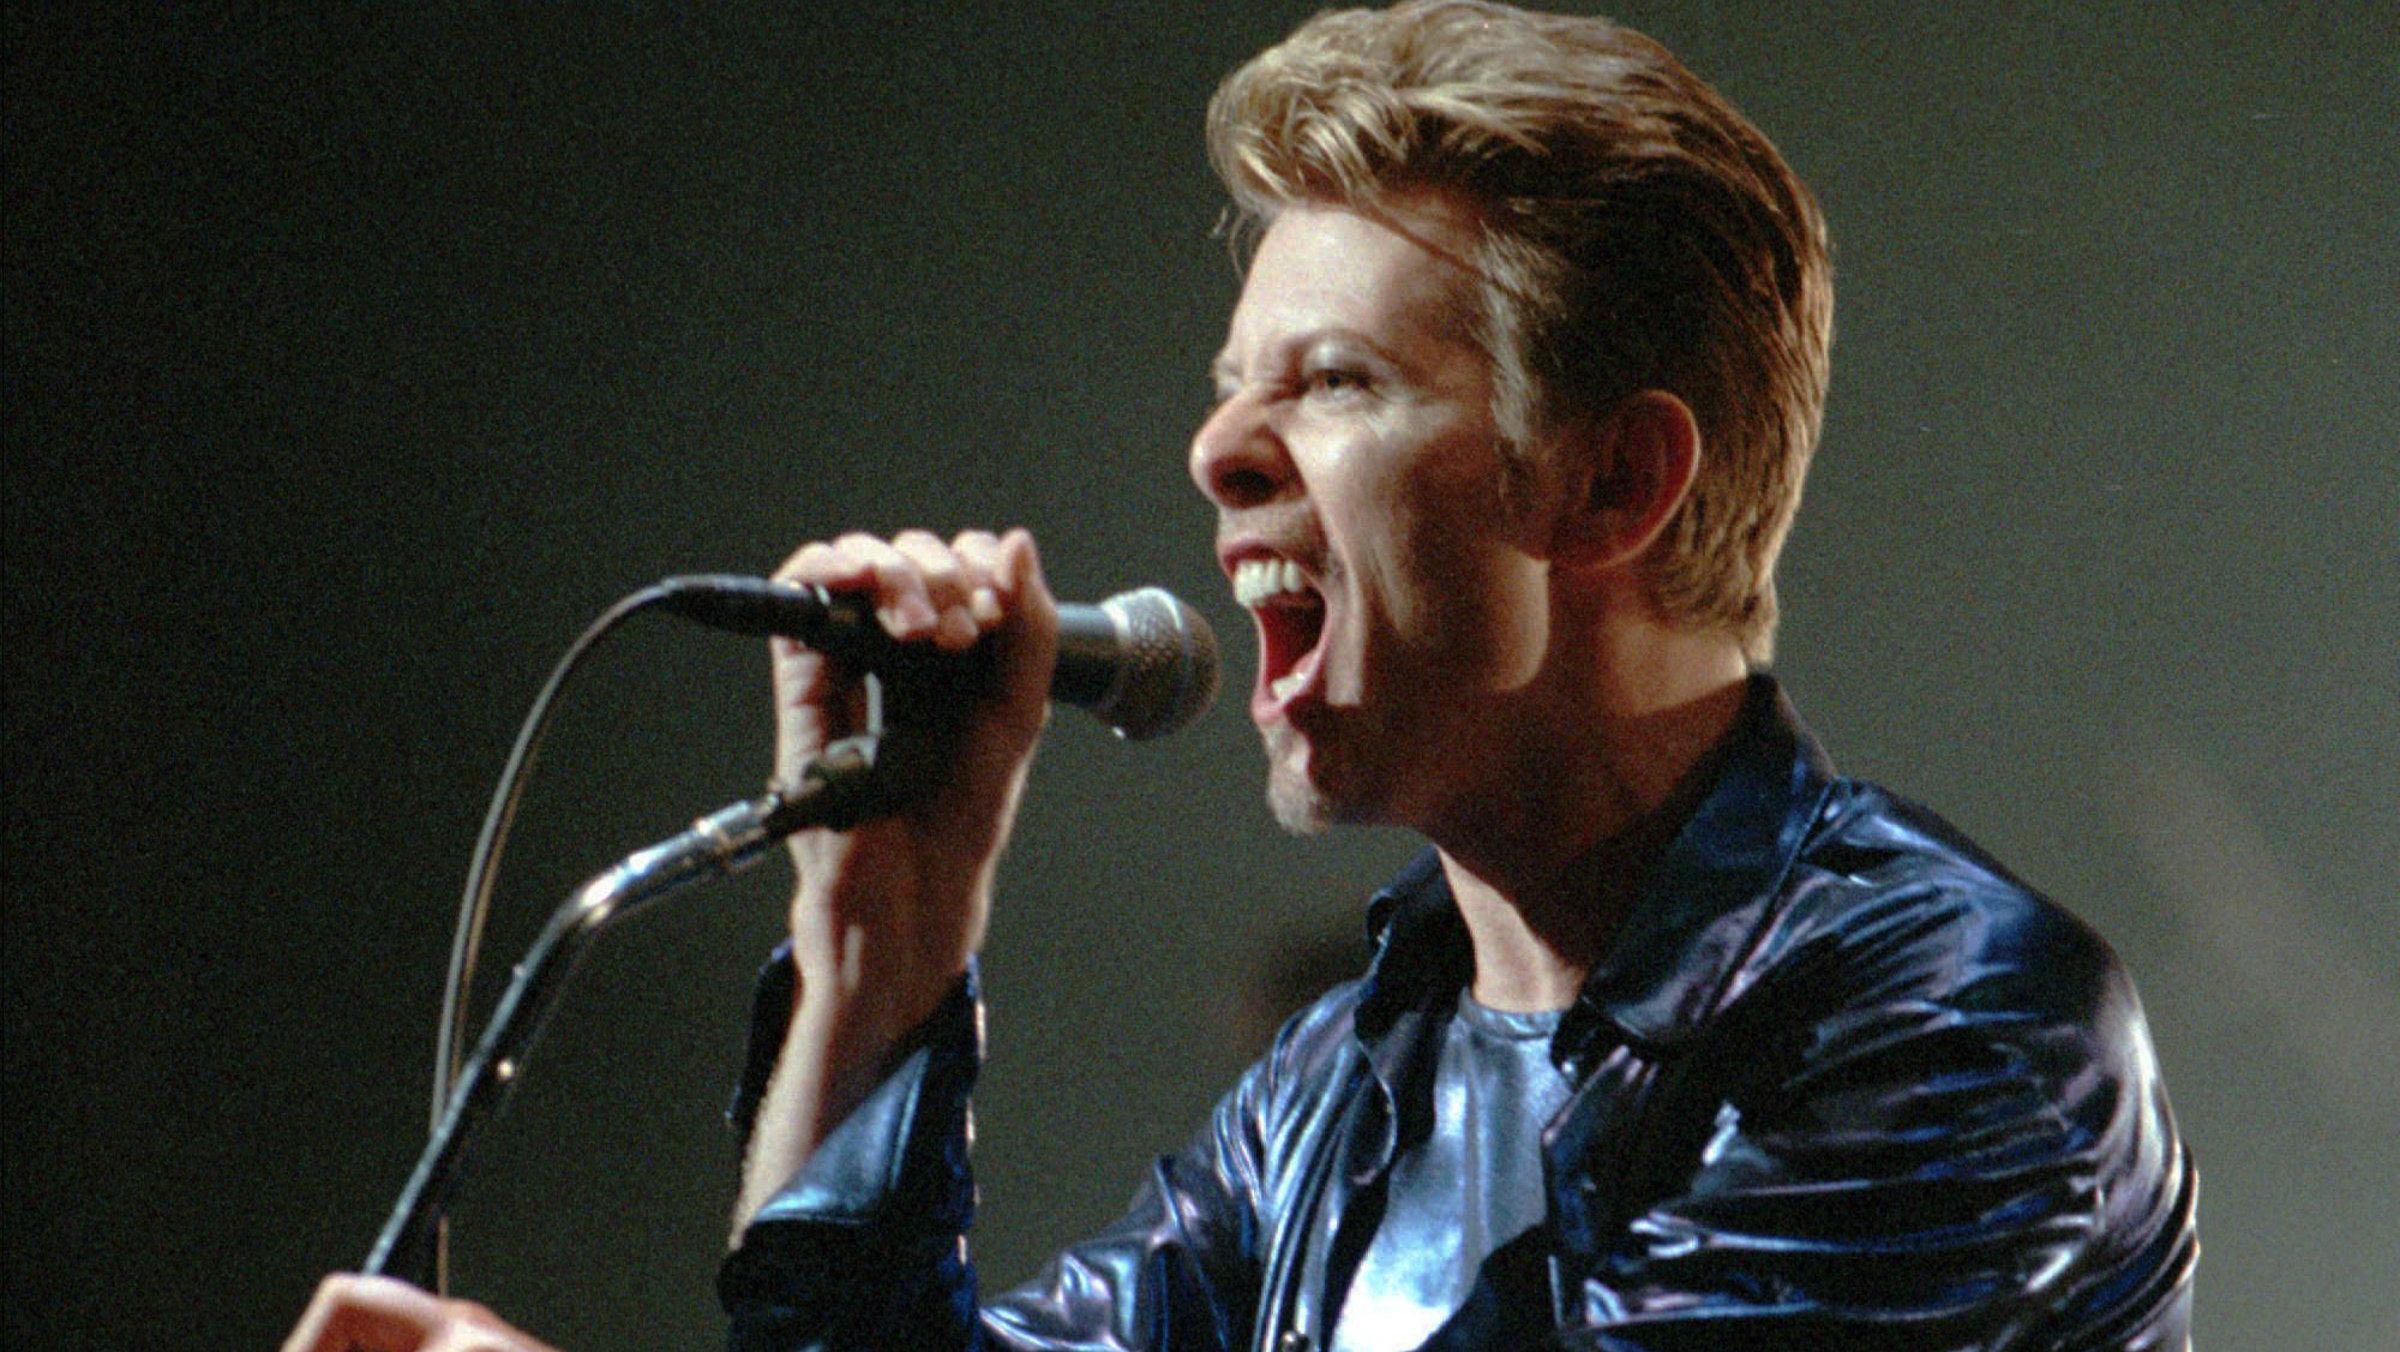 David Bowie in 1995